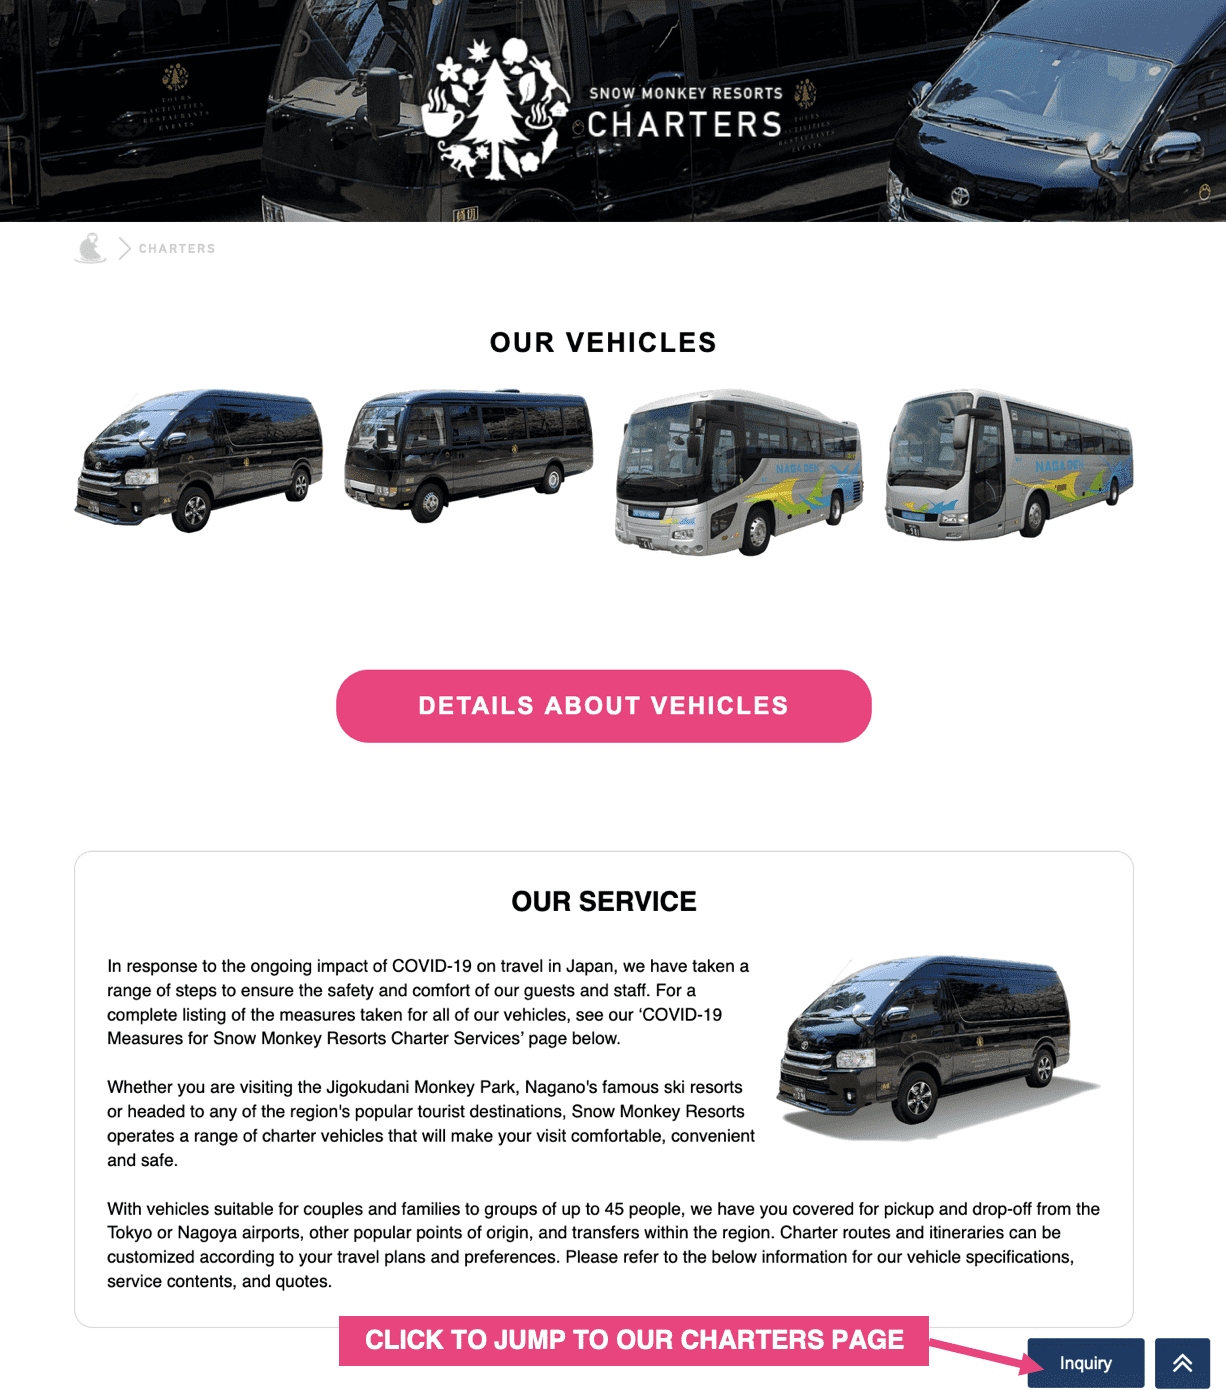 charters-screenshot